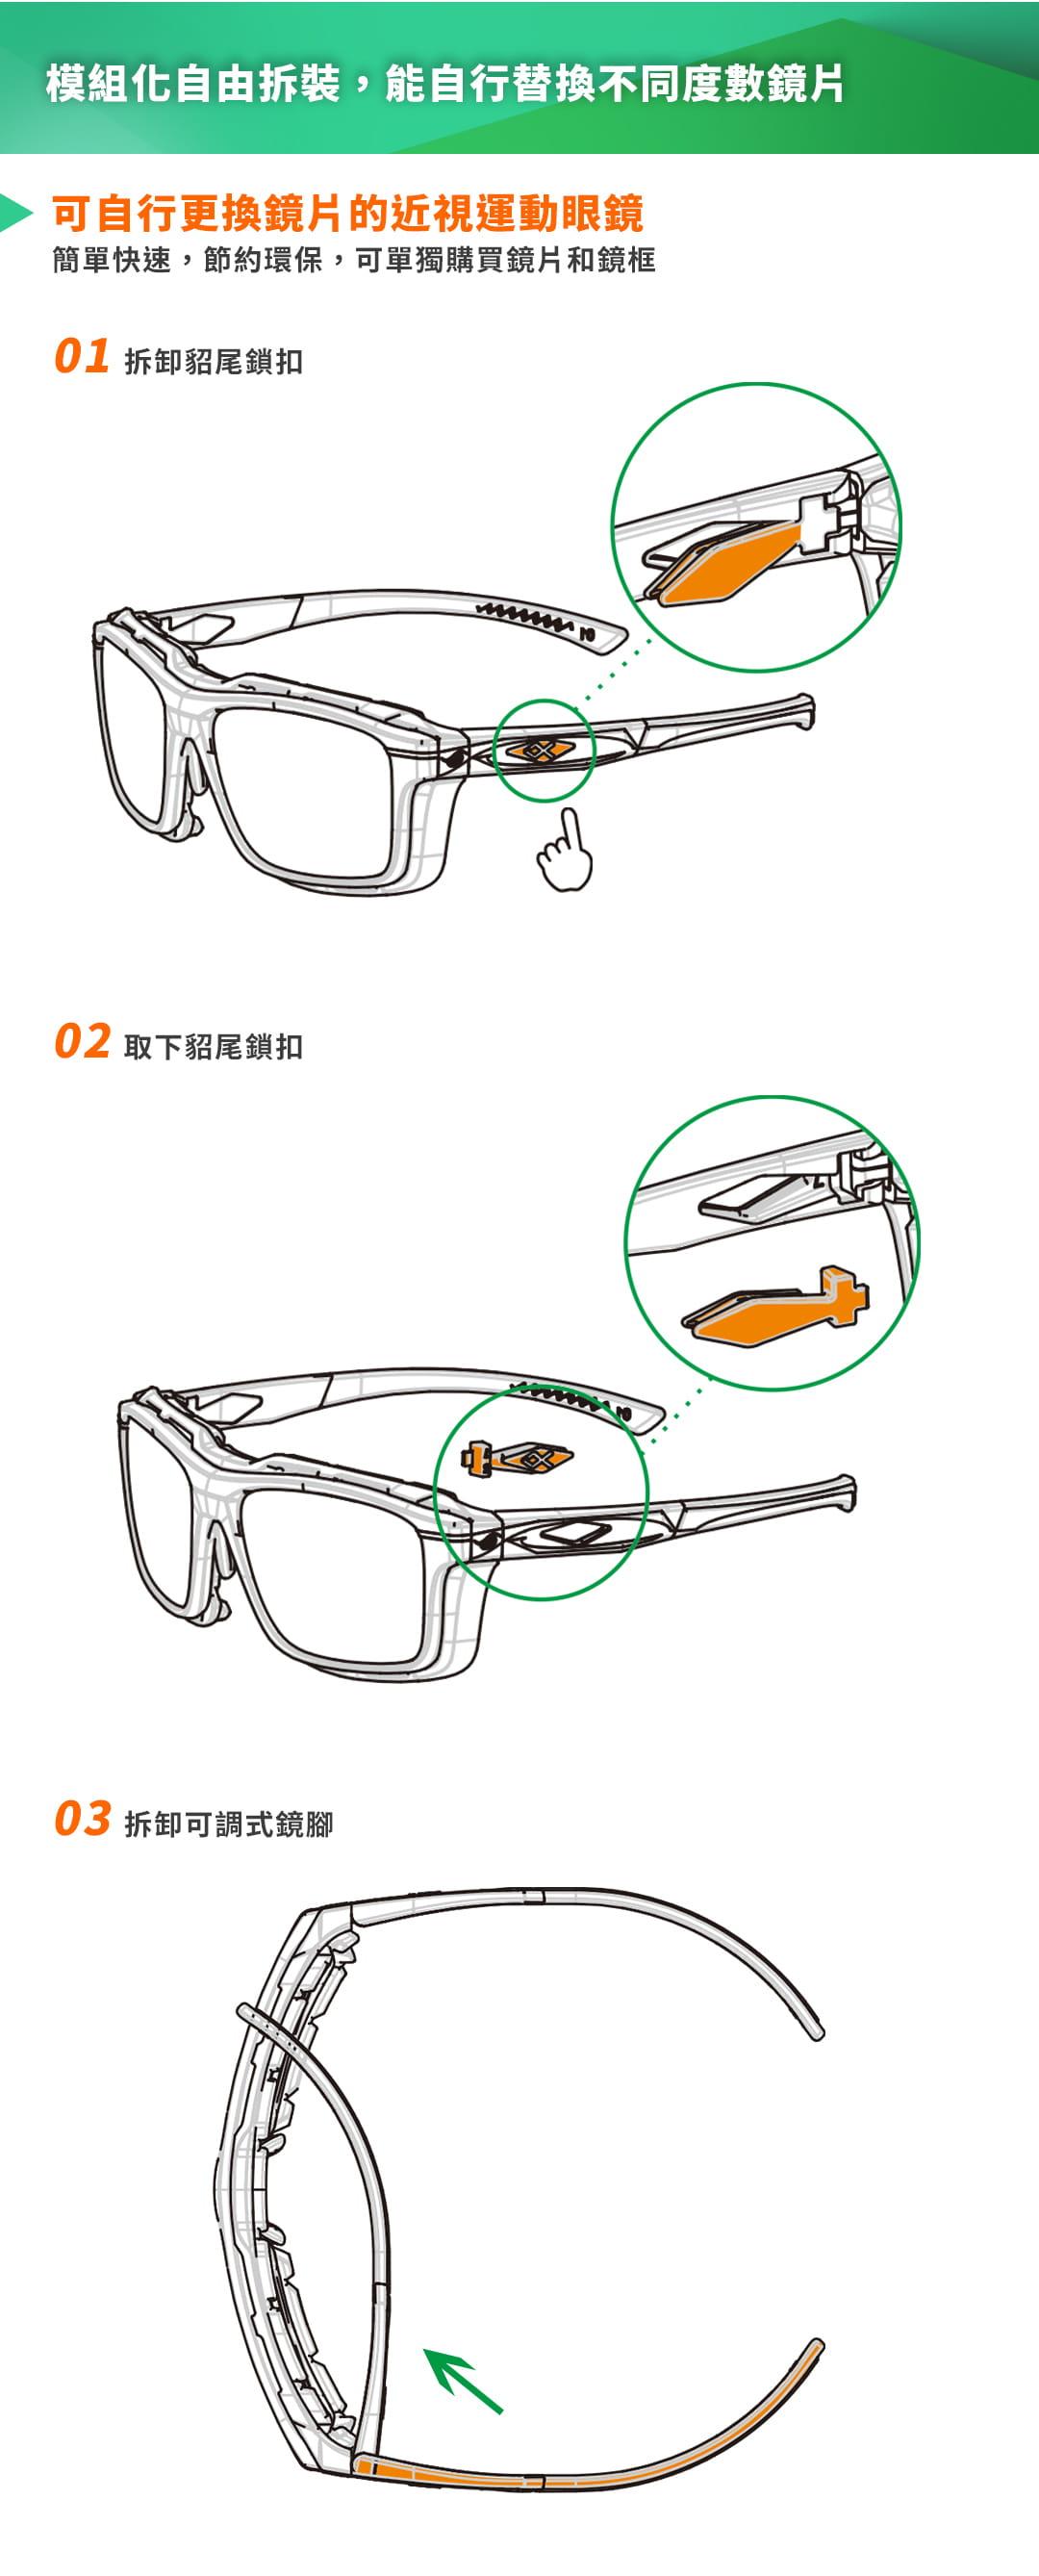 SABLE黑貂光學-專屬球類運動眼鏡CP-823(標準款-無保護墊)+SP-03(平光精緻鍍膜鏡片) 8